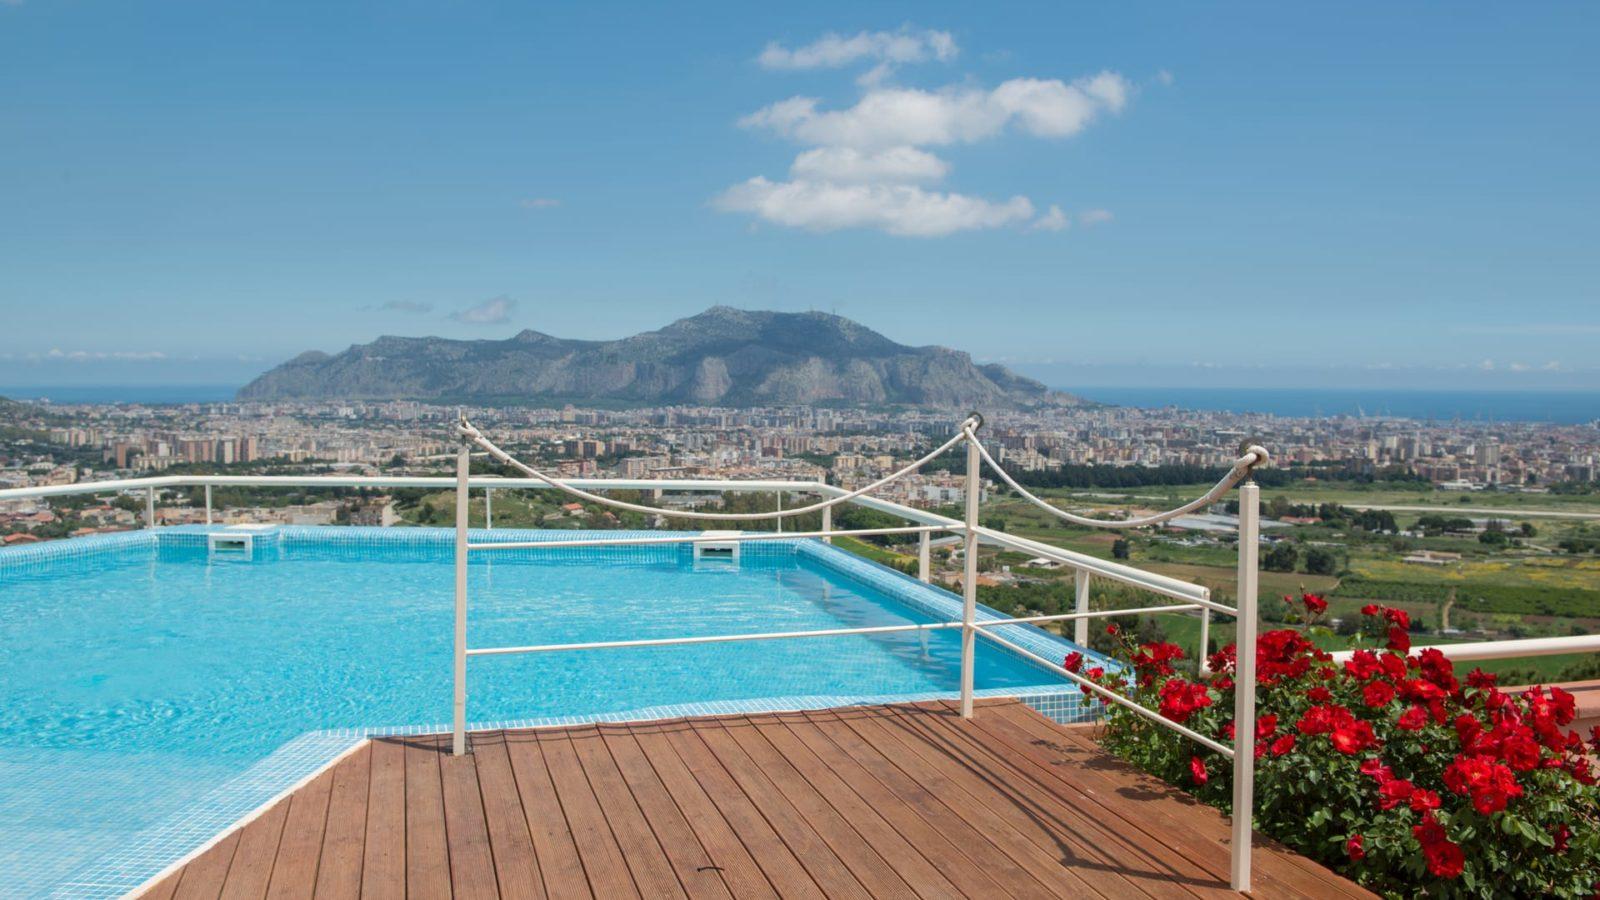 Hotel Bel3 Palermo (Sicilia, Italia)